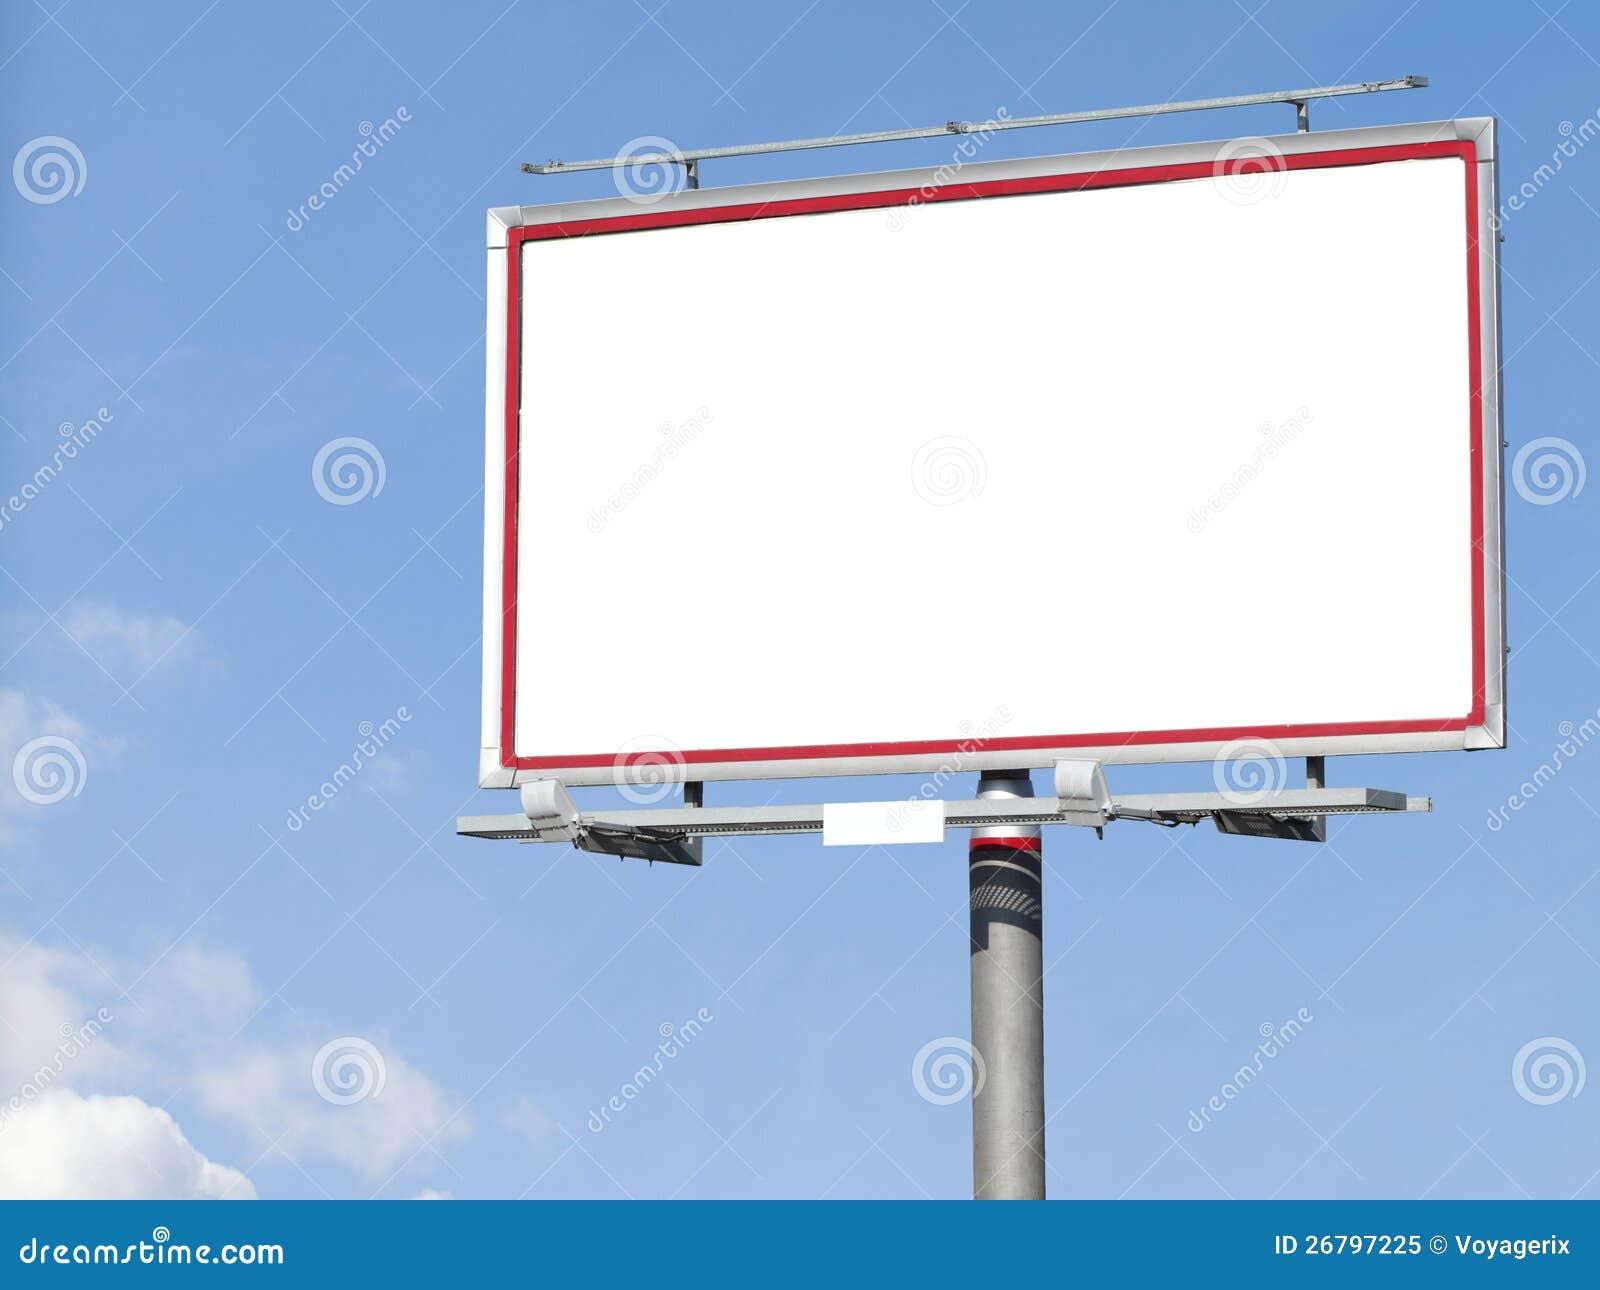 Empty Billboard Clipart - More information